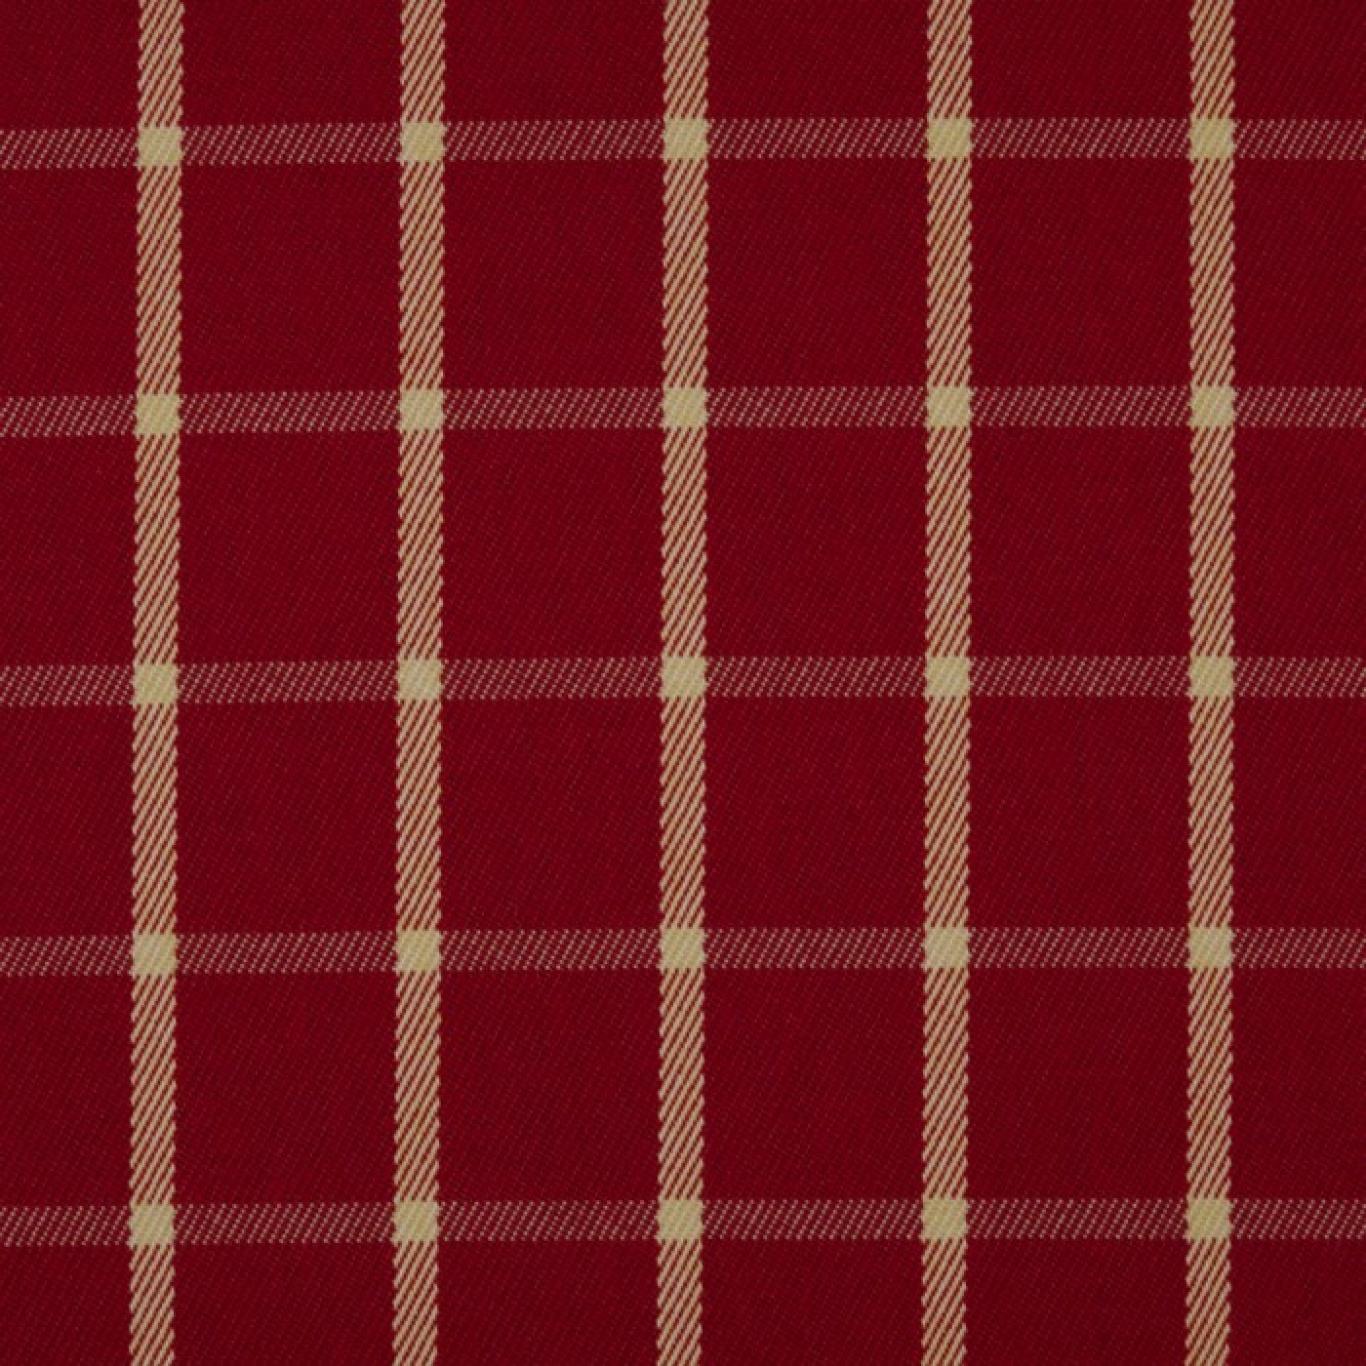 Image of Prestigious Halkirk Cardinal Fabric